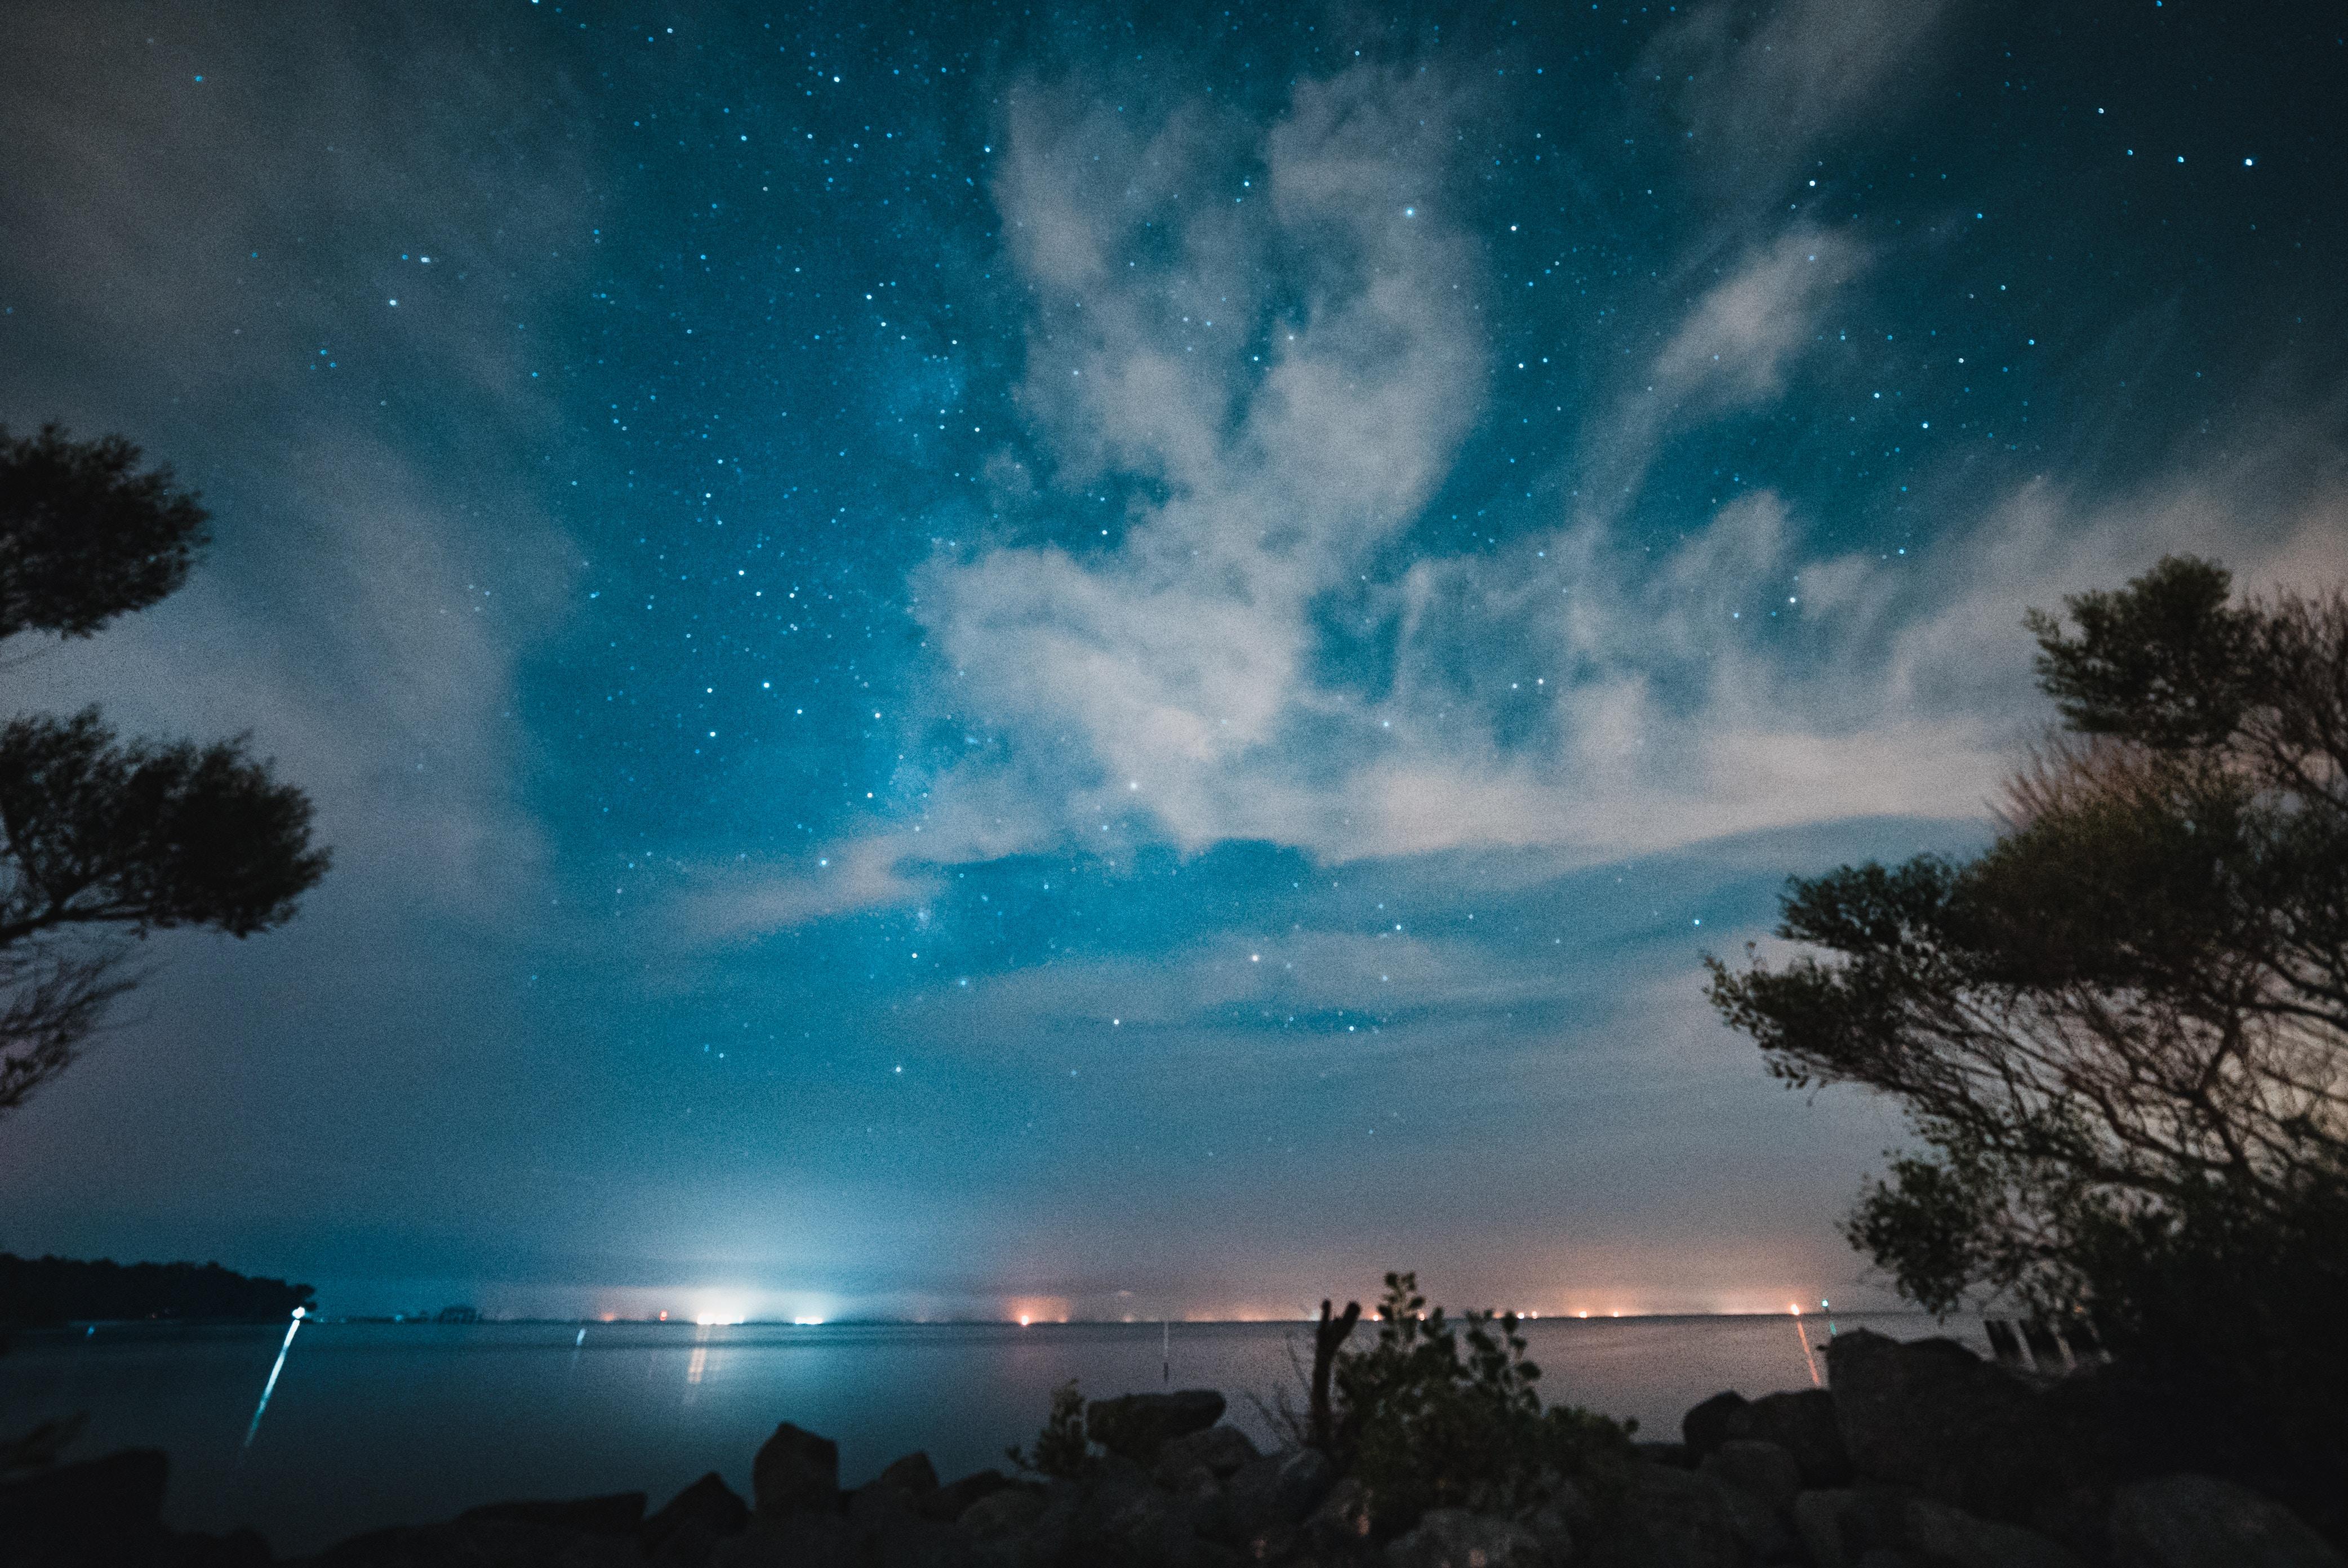 Wallpaper starry sky night river 4168x2784     1182732   HD 4168x2784